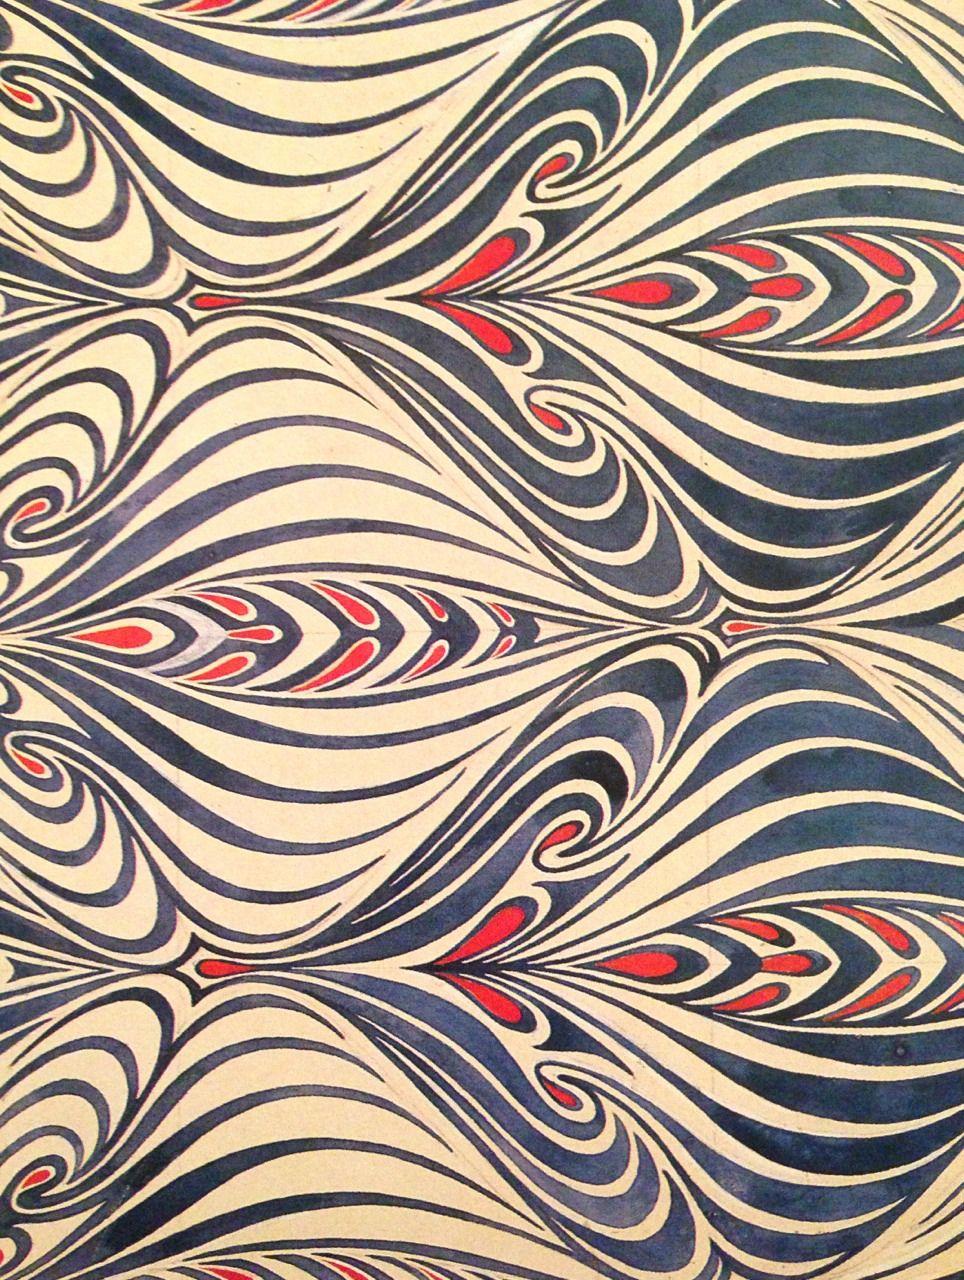 Patterntheory from a book on art nouveau prints for Art nouveau wallpaper uk